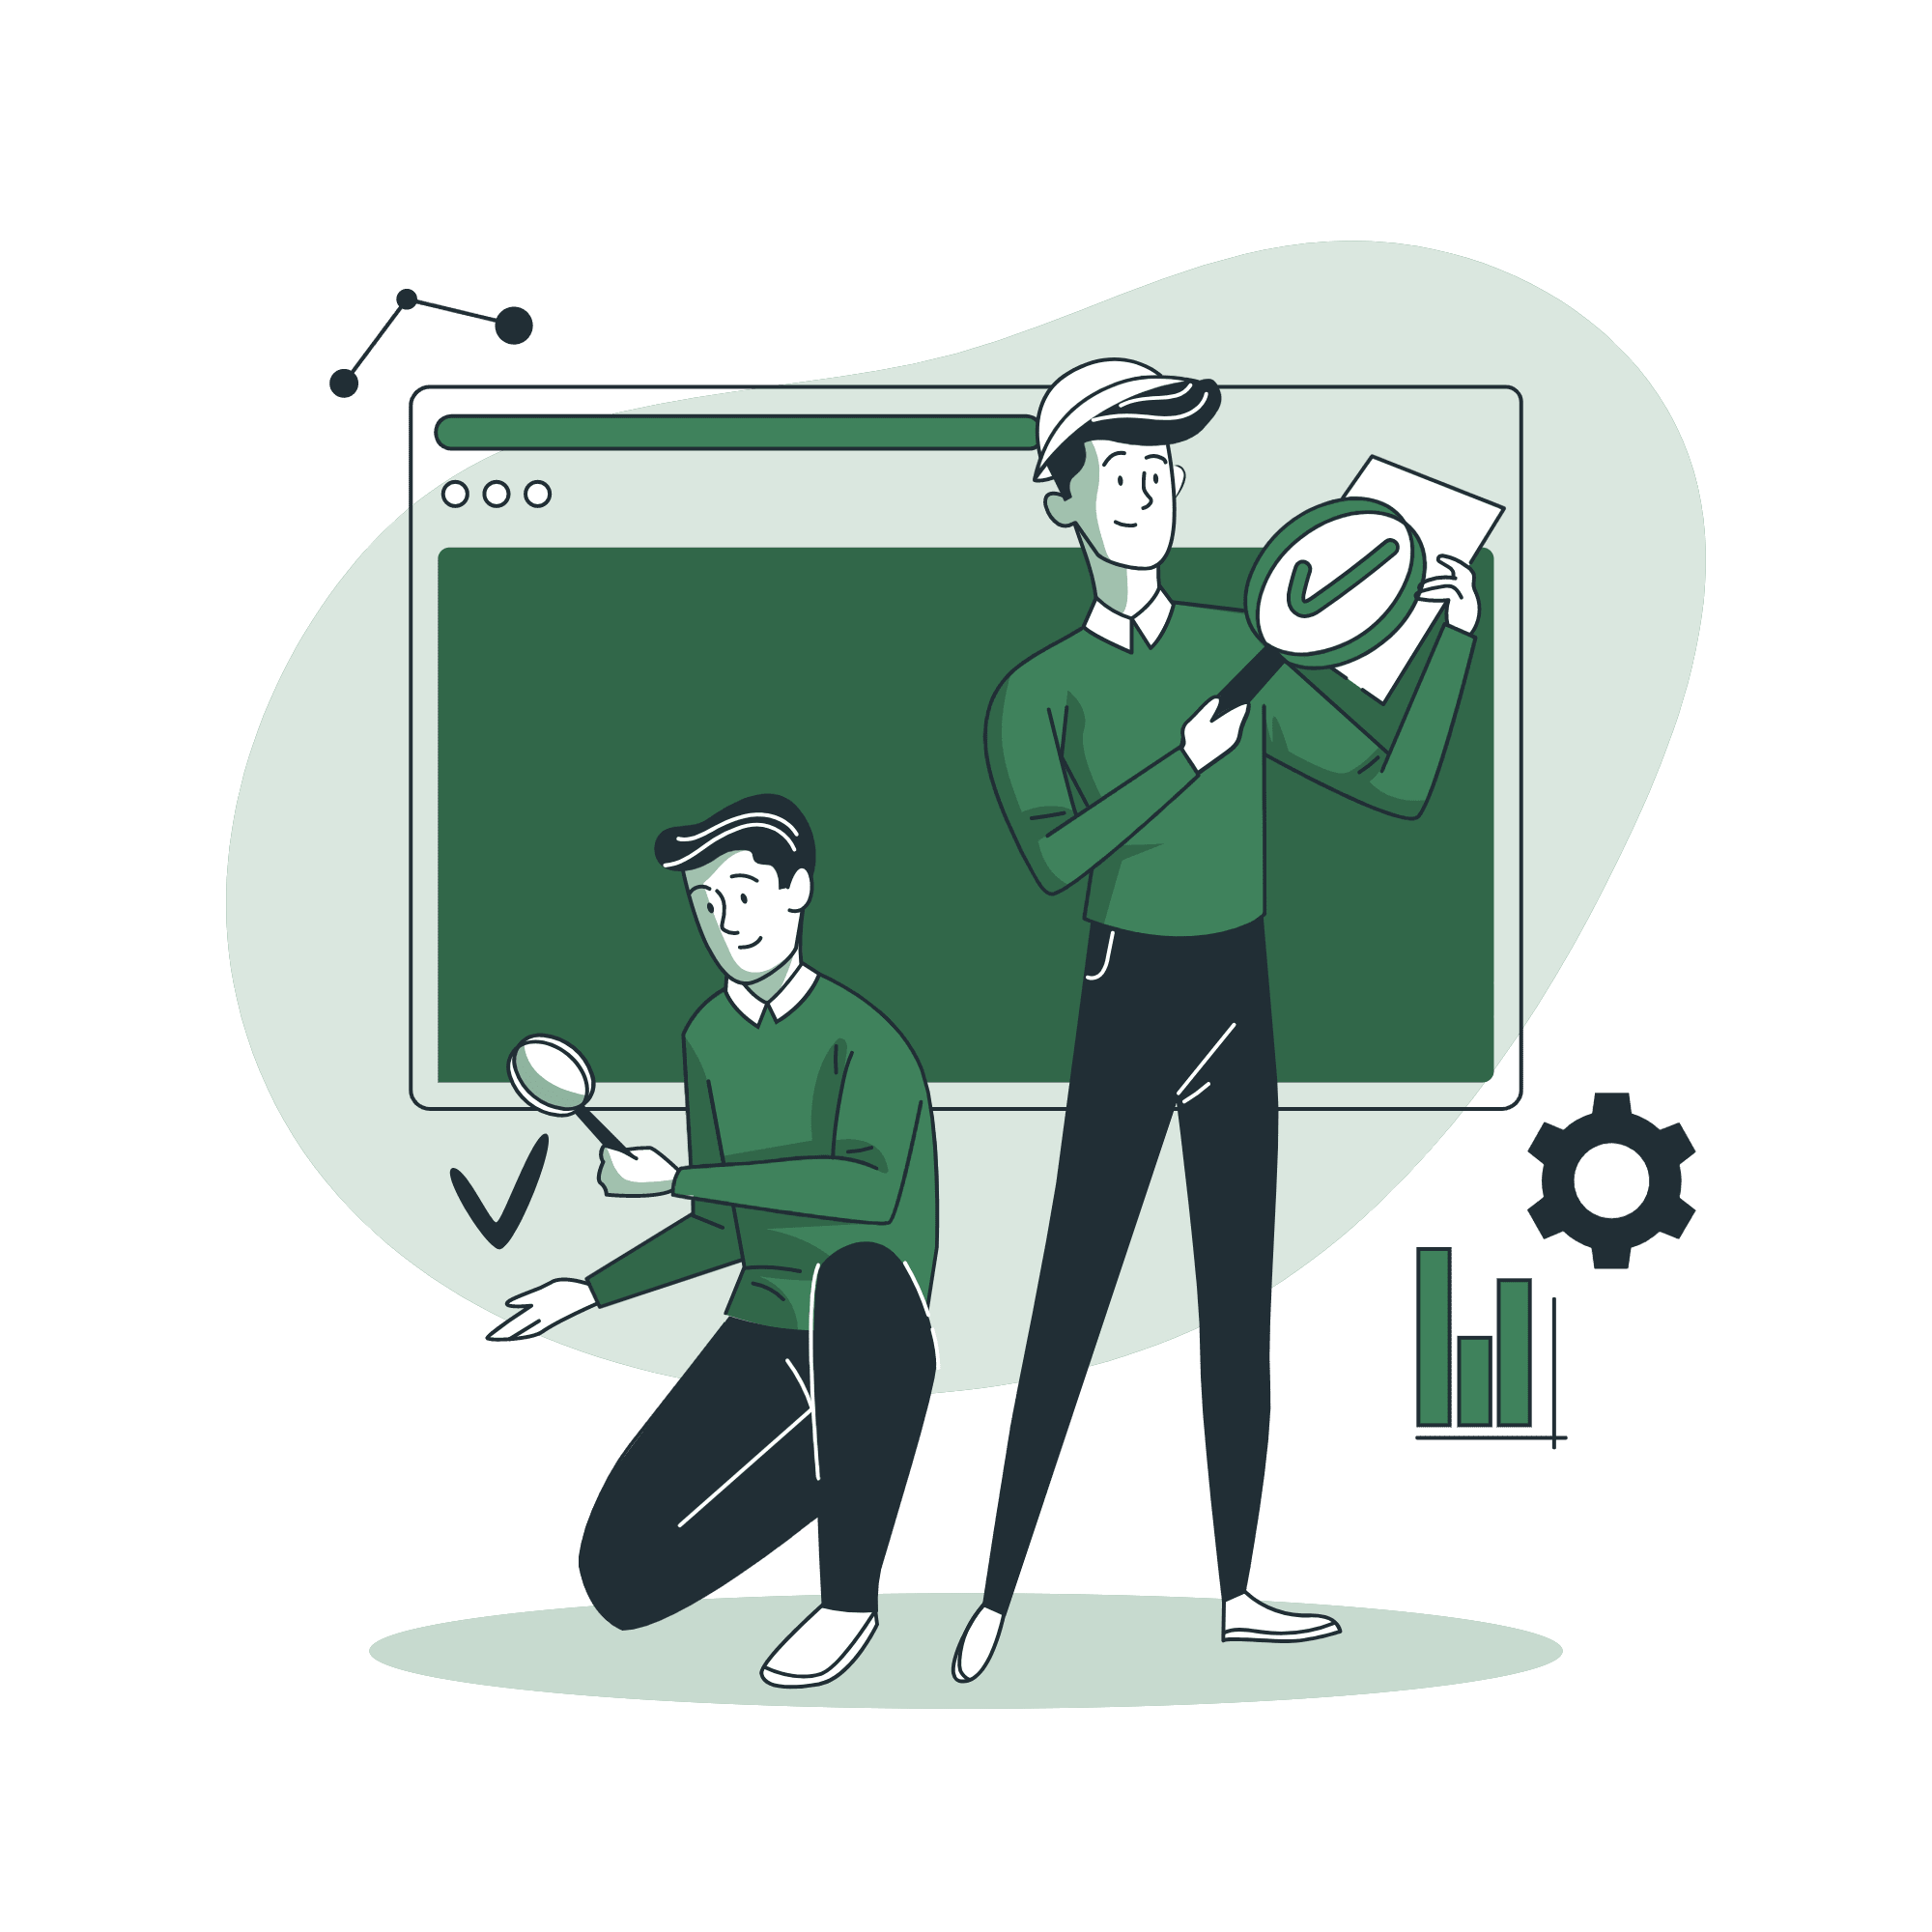 Illustration by Freepik Storyset